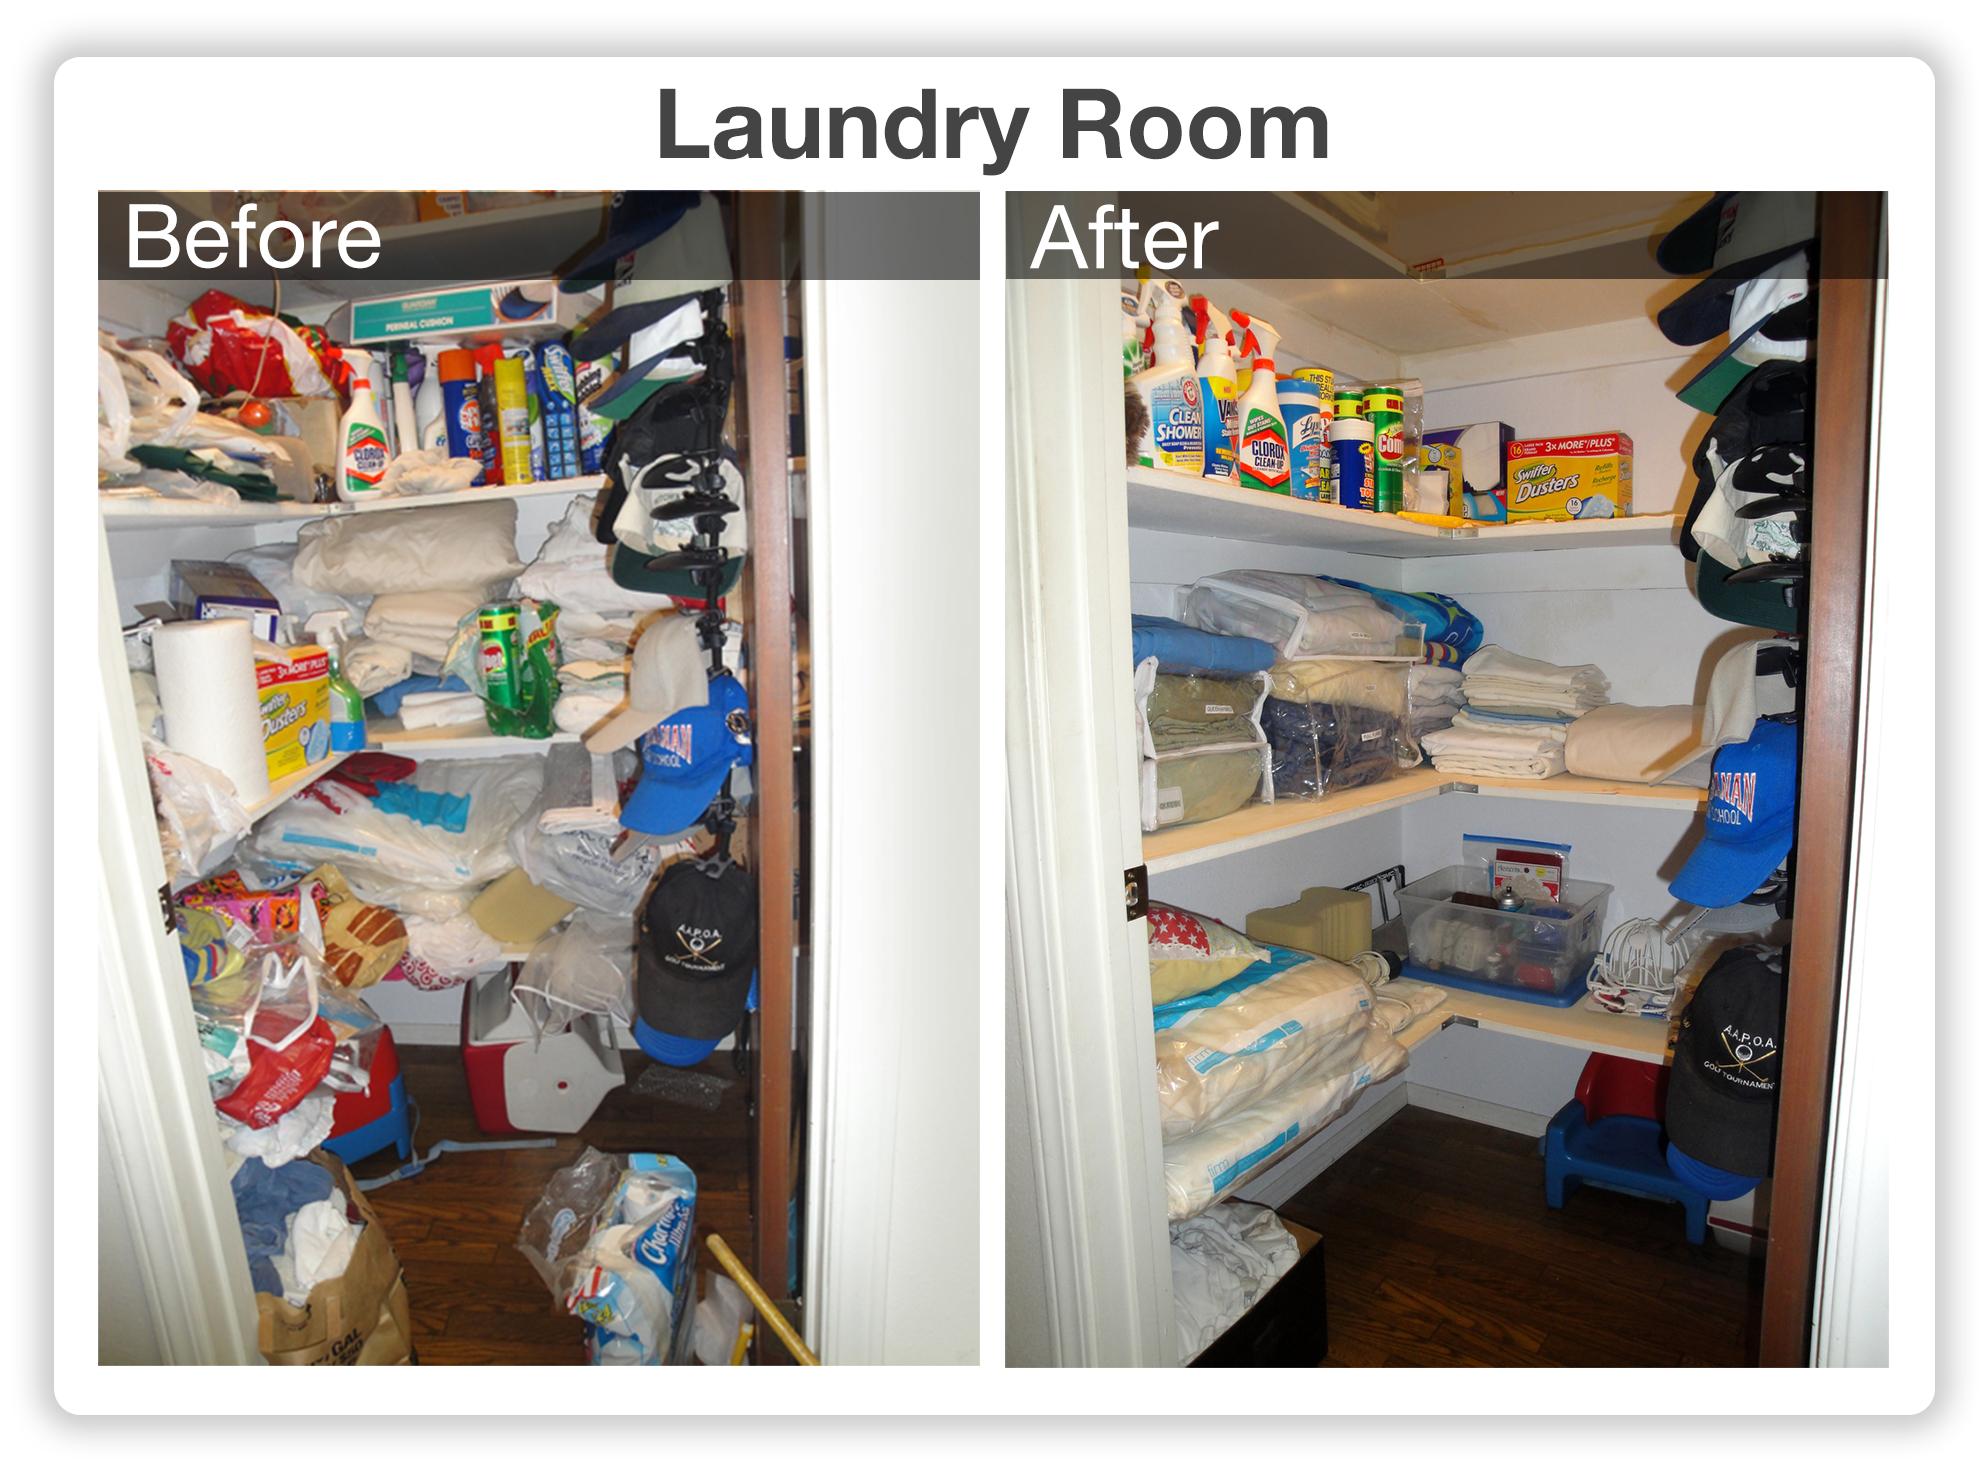 organized_by_choice_laundry_room.jpg